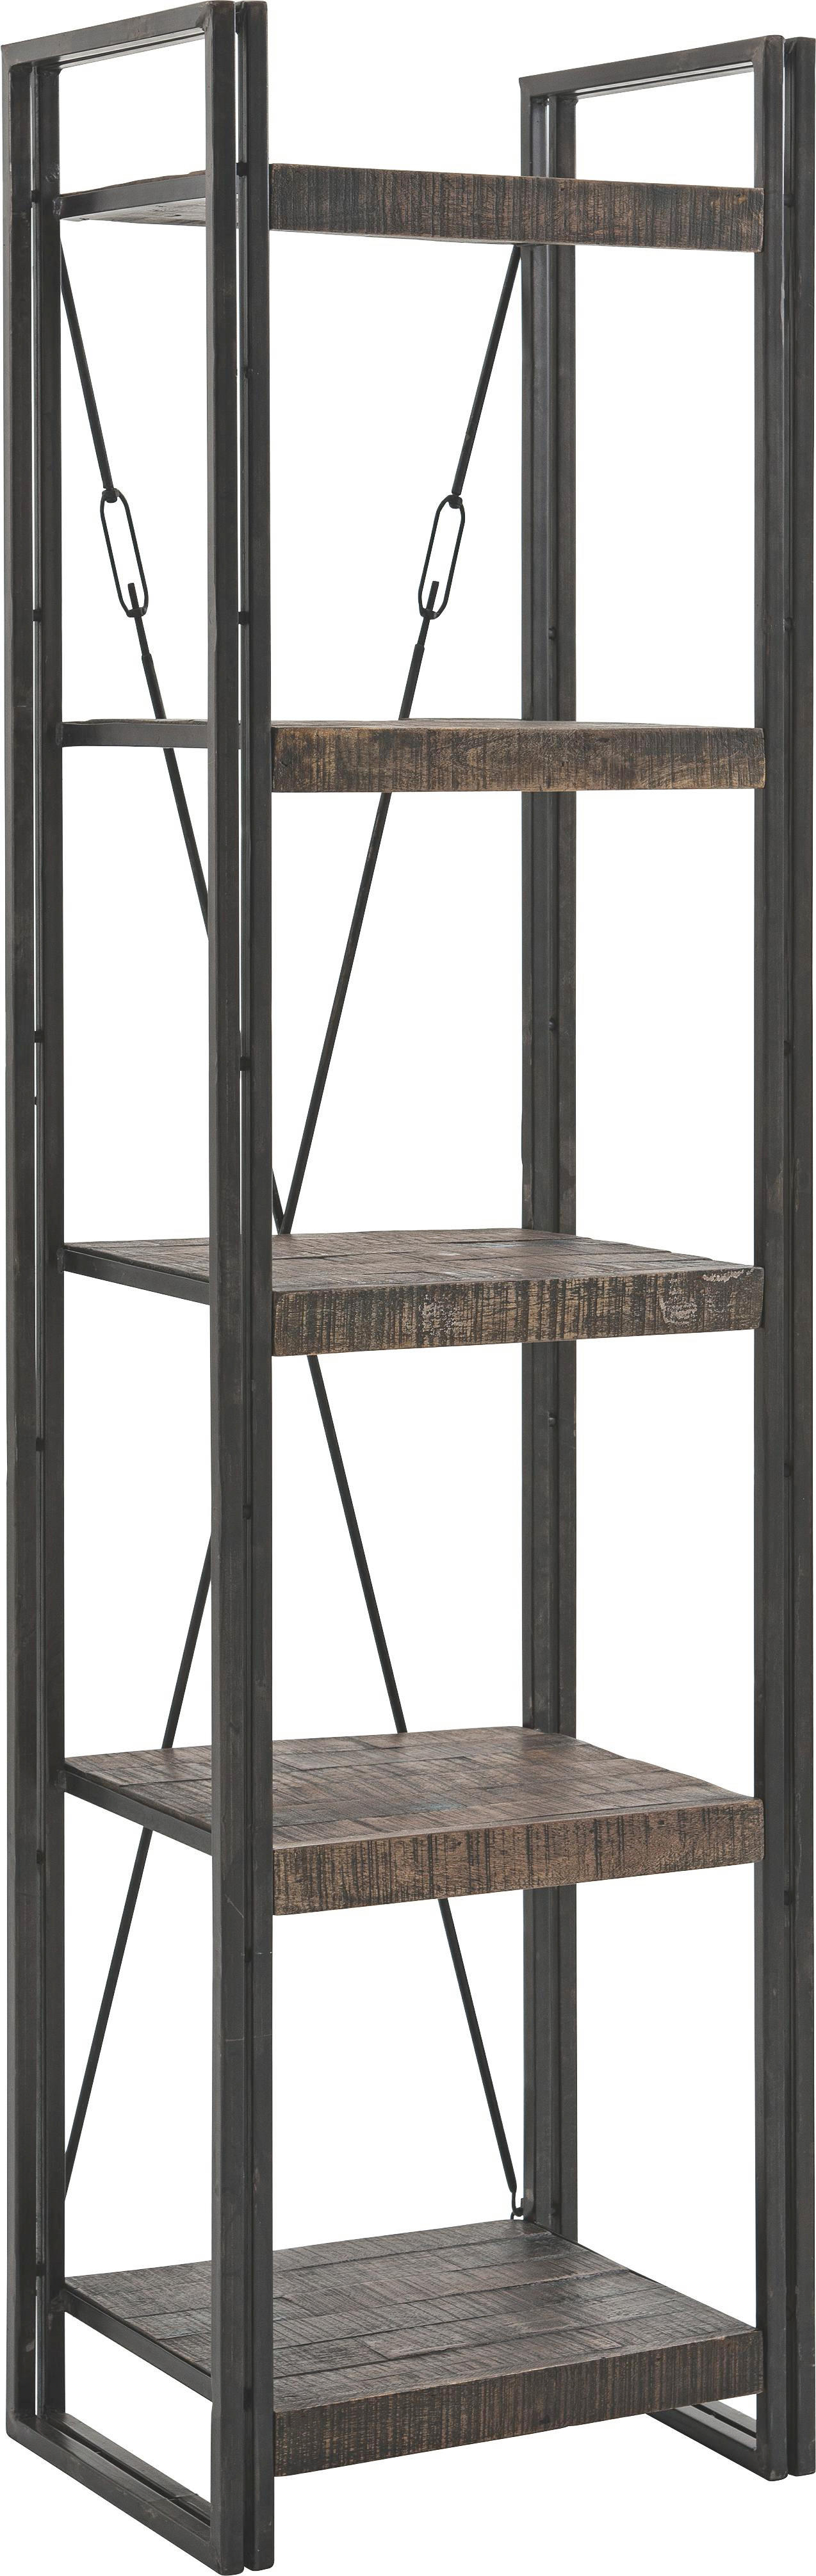 HYLLA - brun, Design, metall/trä (55/200/40cm)